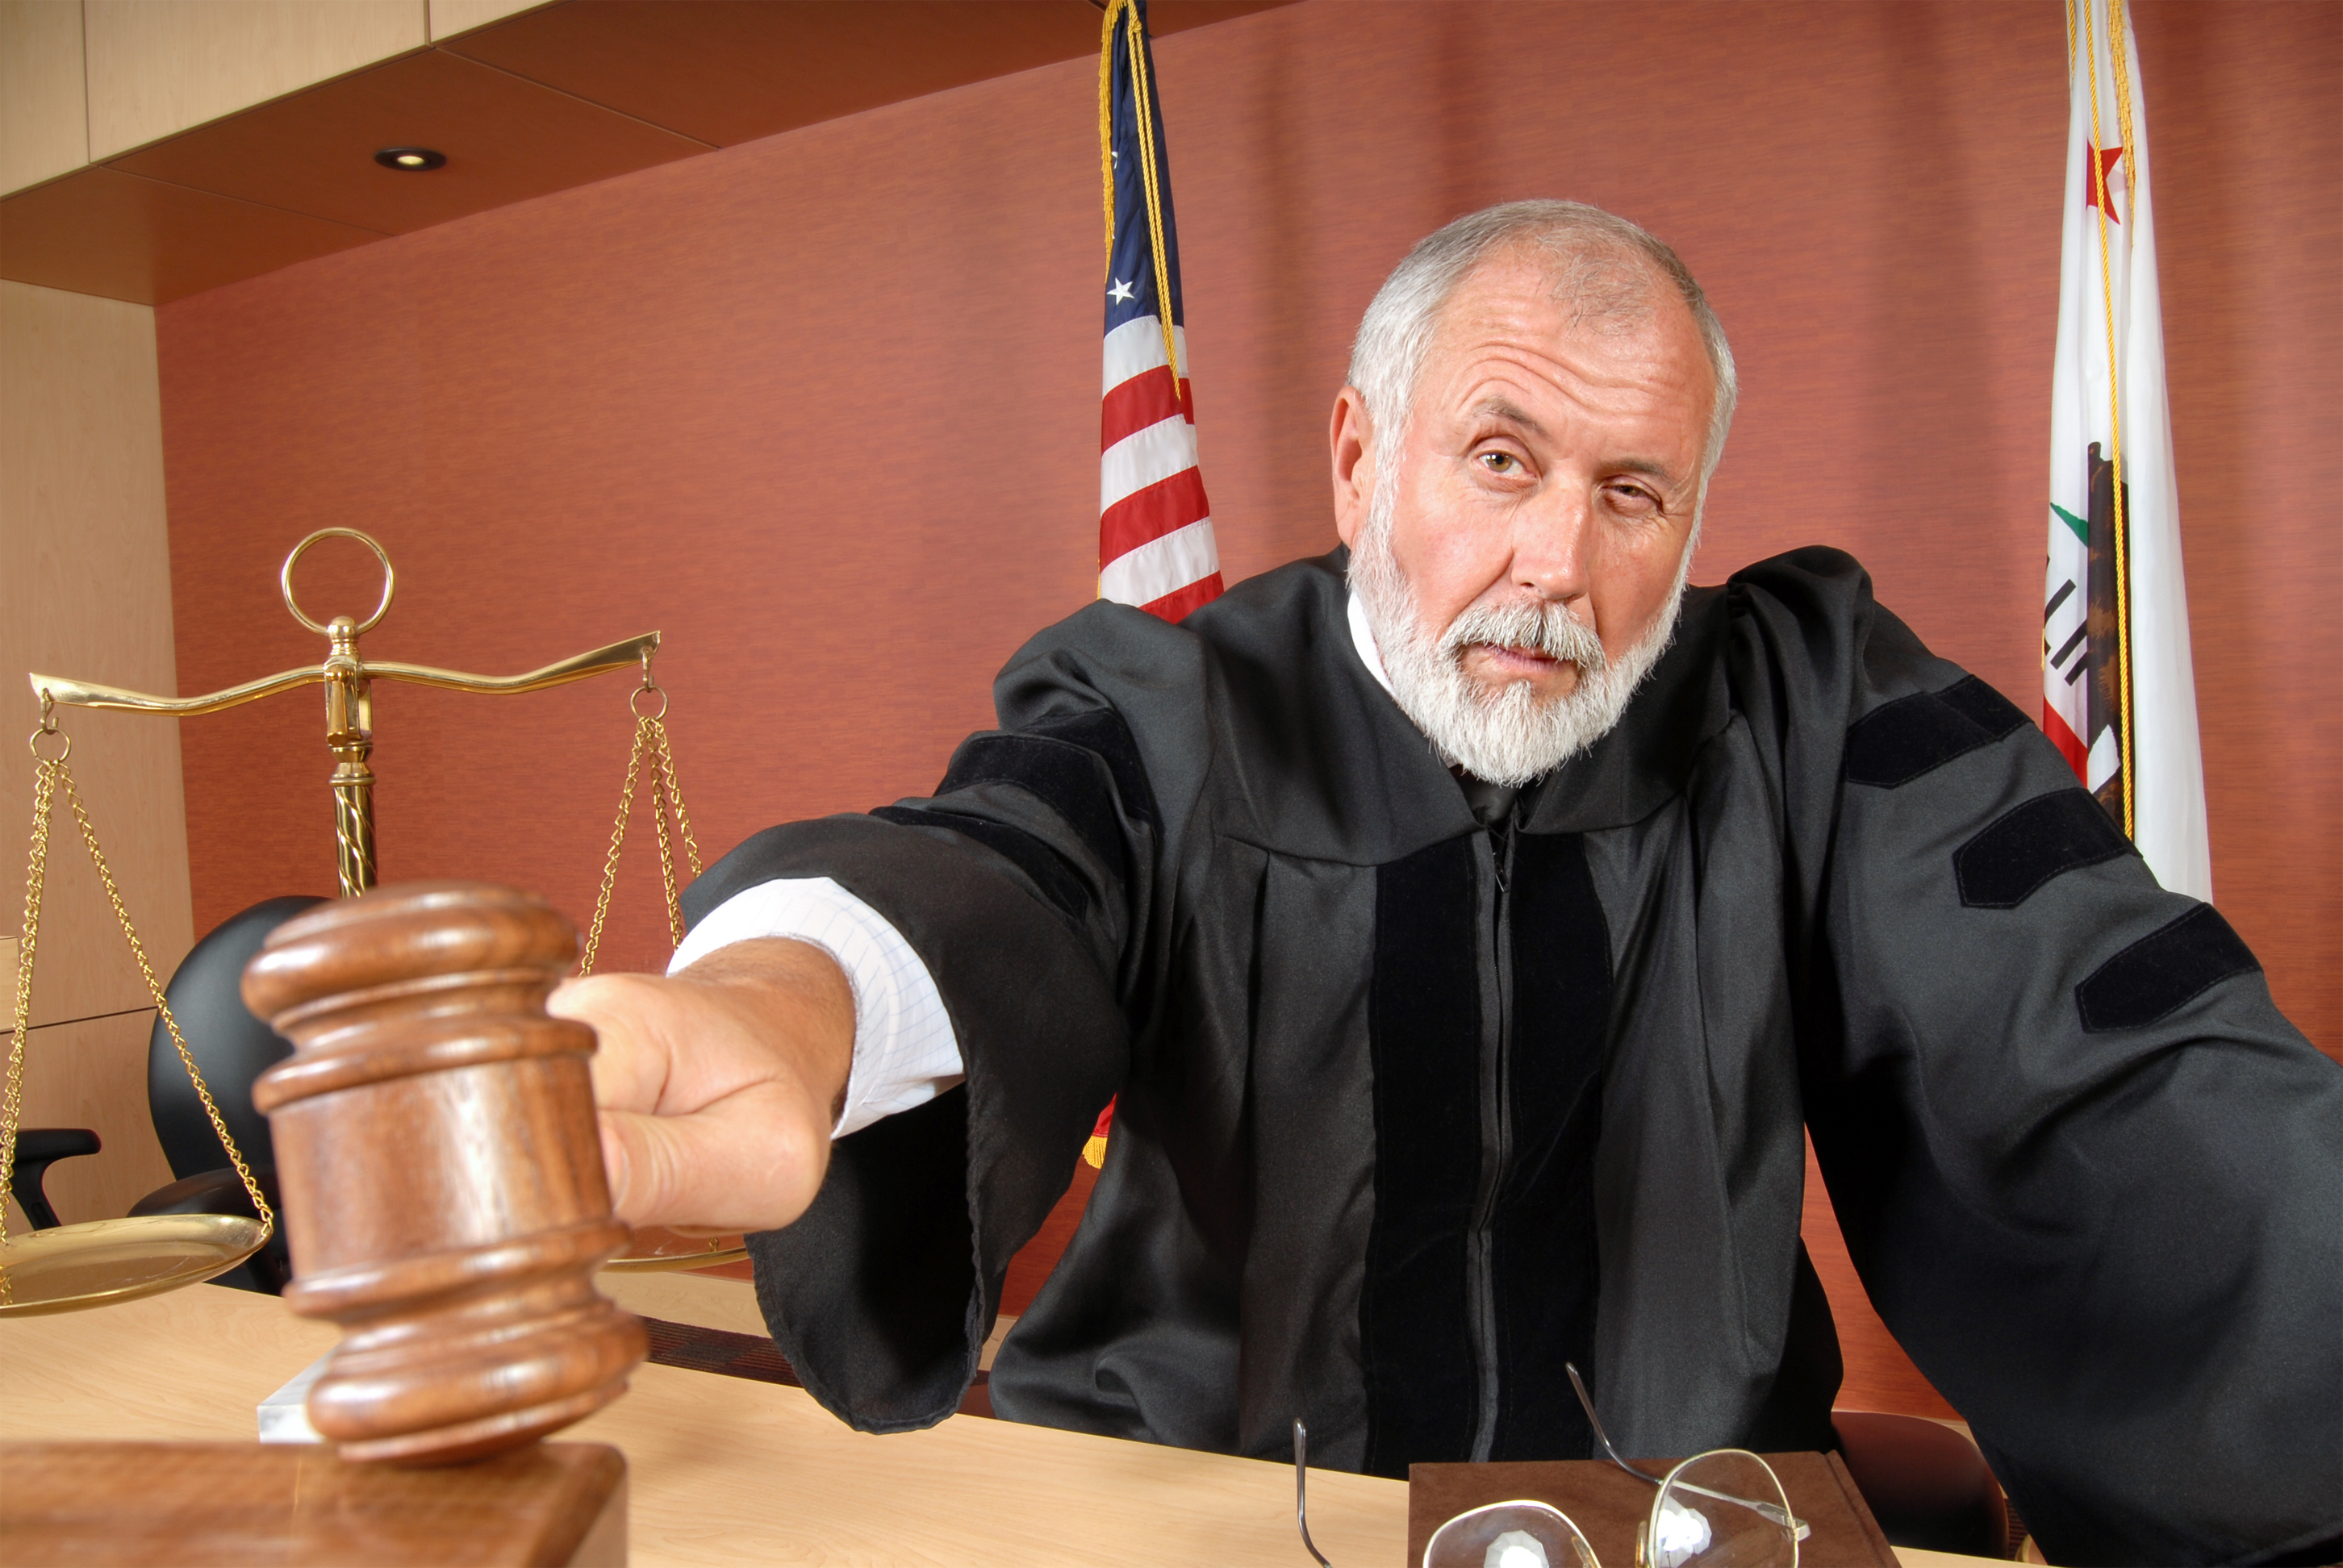 judge dreamstime_l_5084885